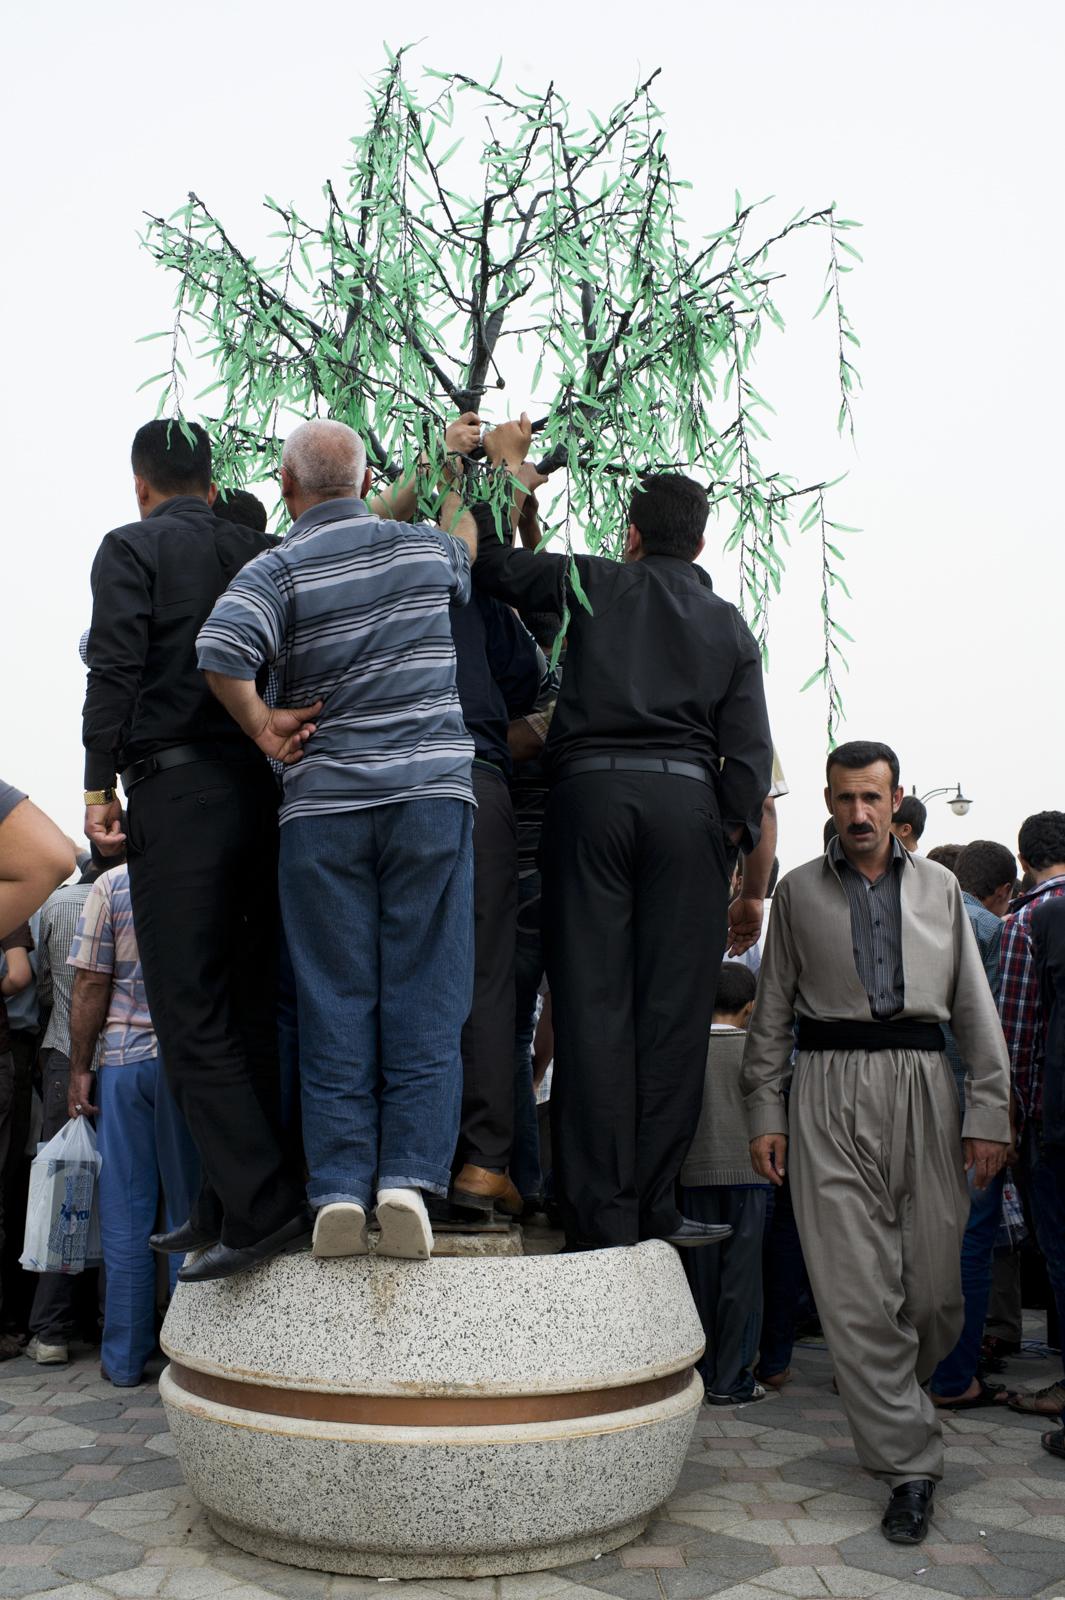 02_kurdistan_fabian-stamm_20120409.jpg